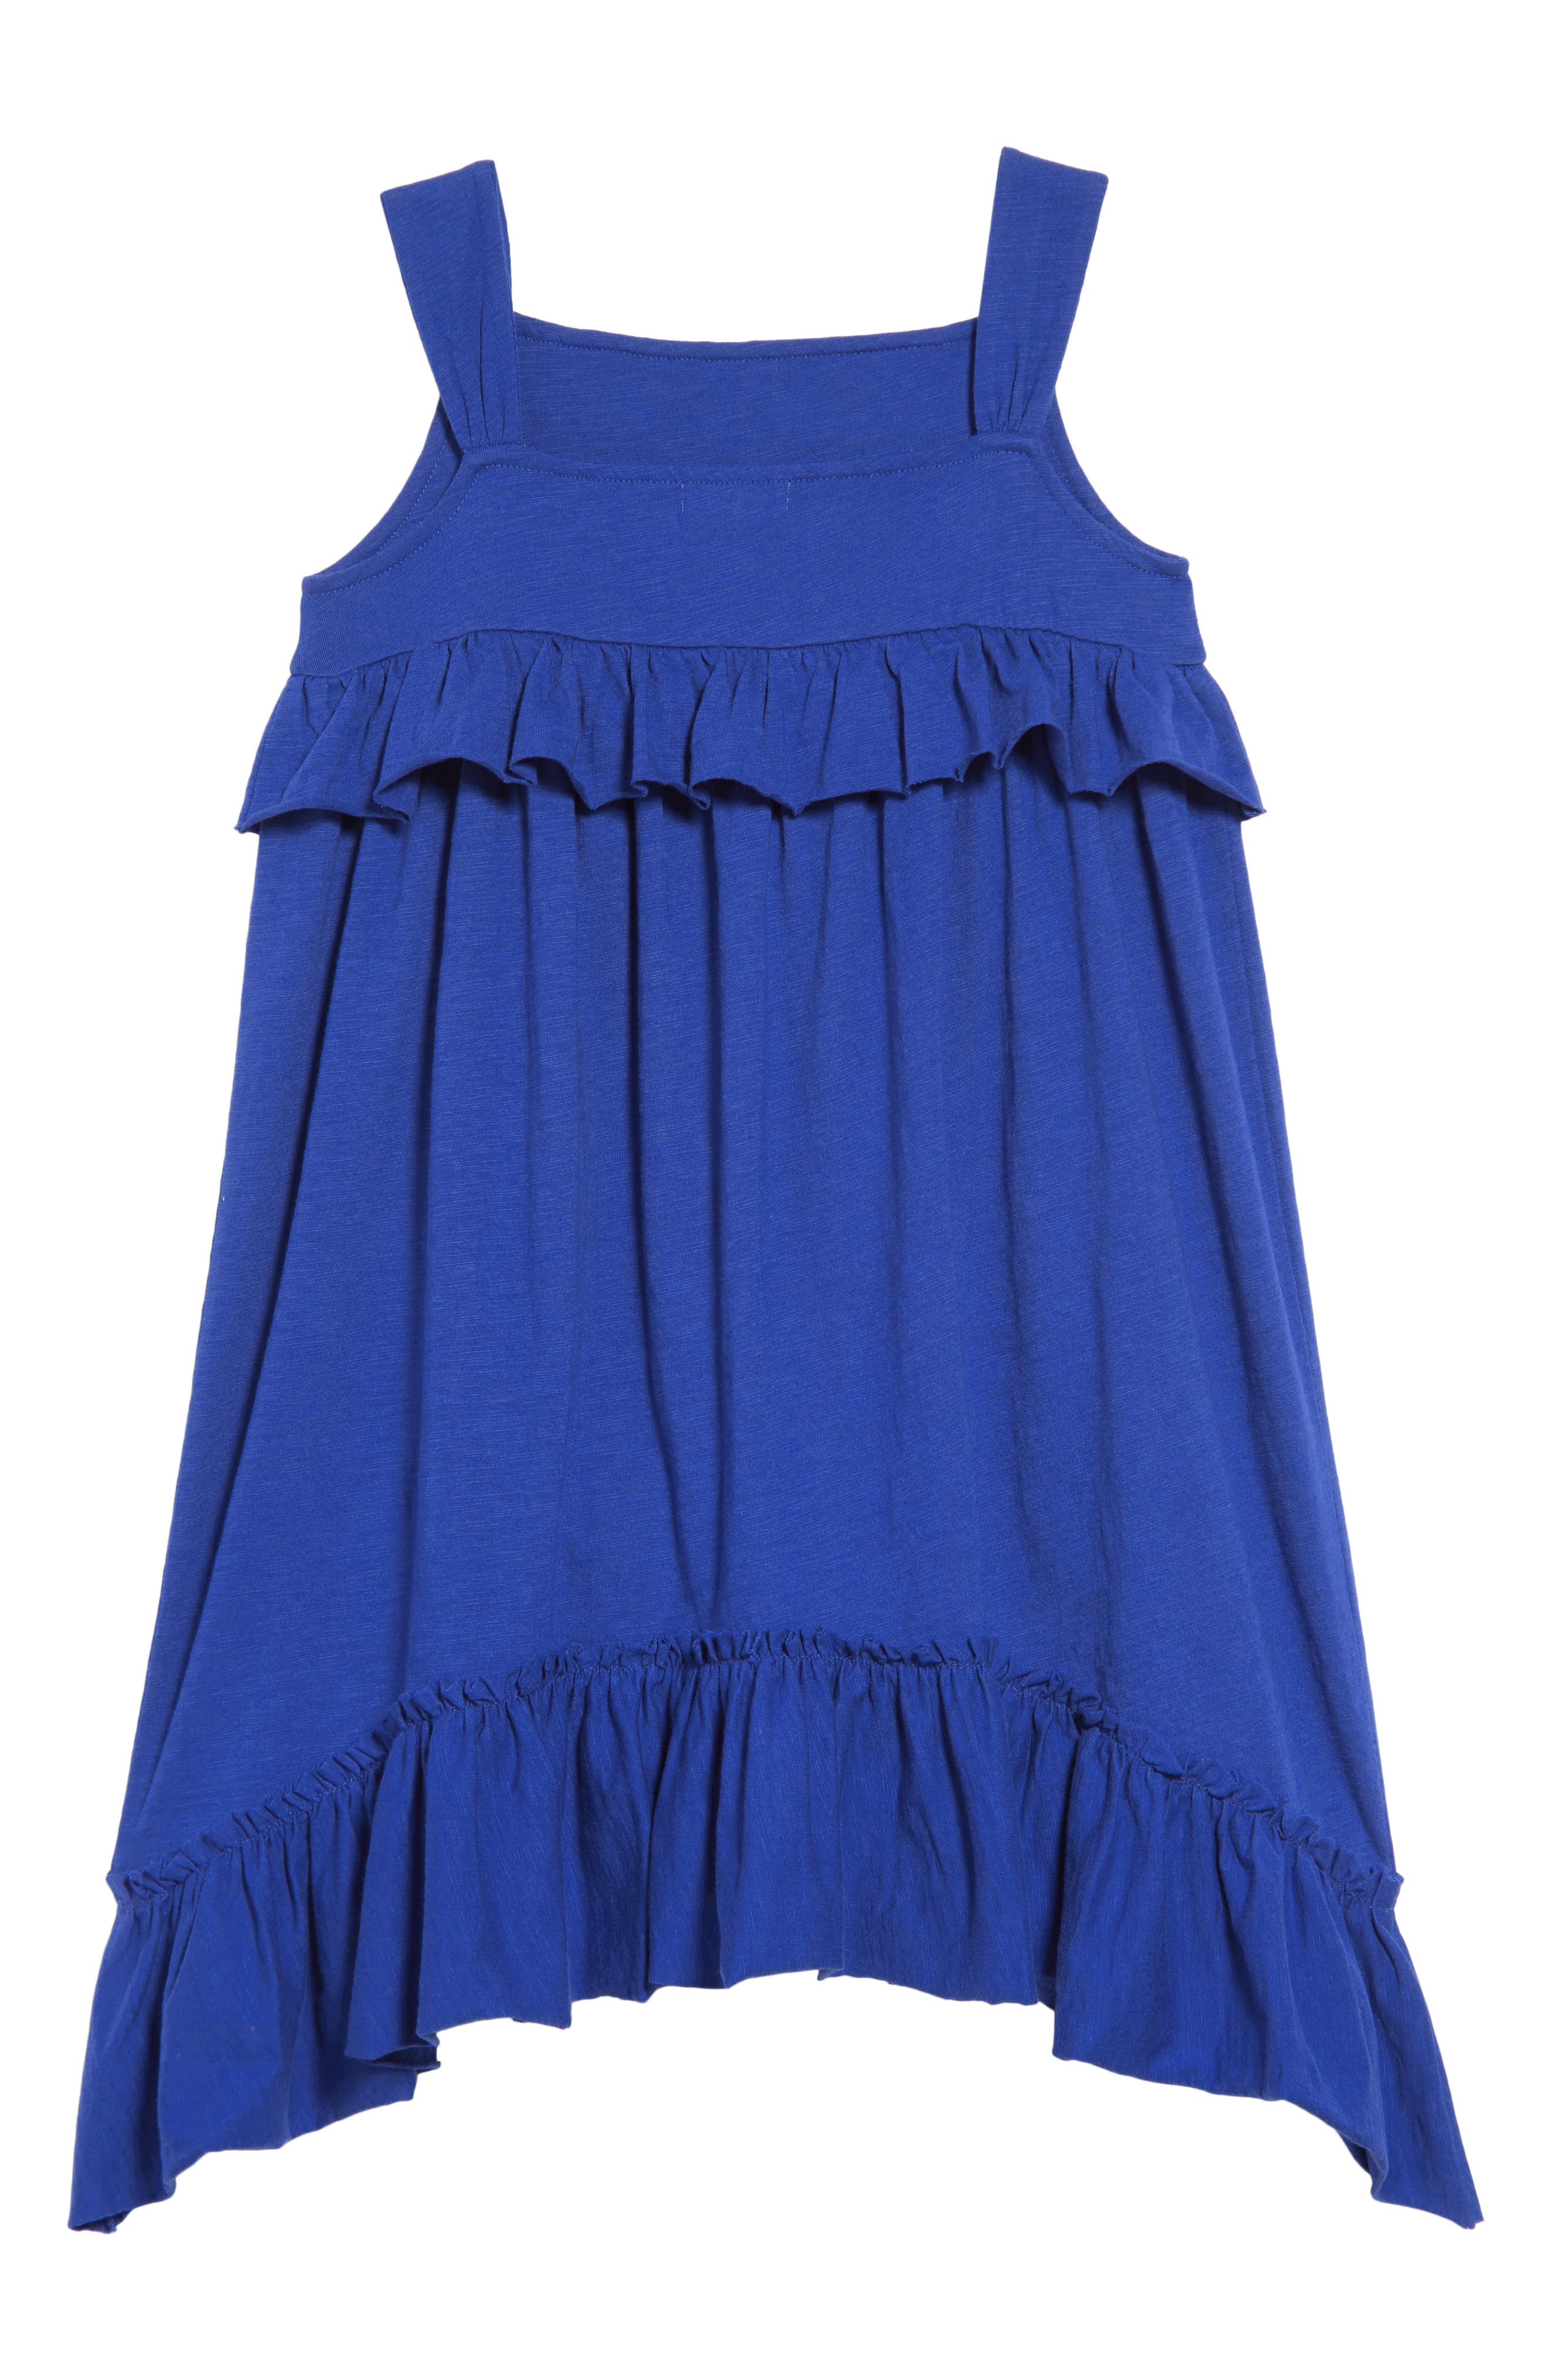 CREWCUTS BY J.CREW,                             Mimi Ruffle Dress,                             Alternate thumbnail 2, color,                             400